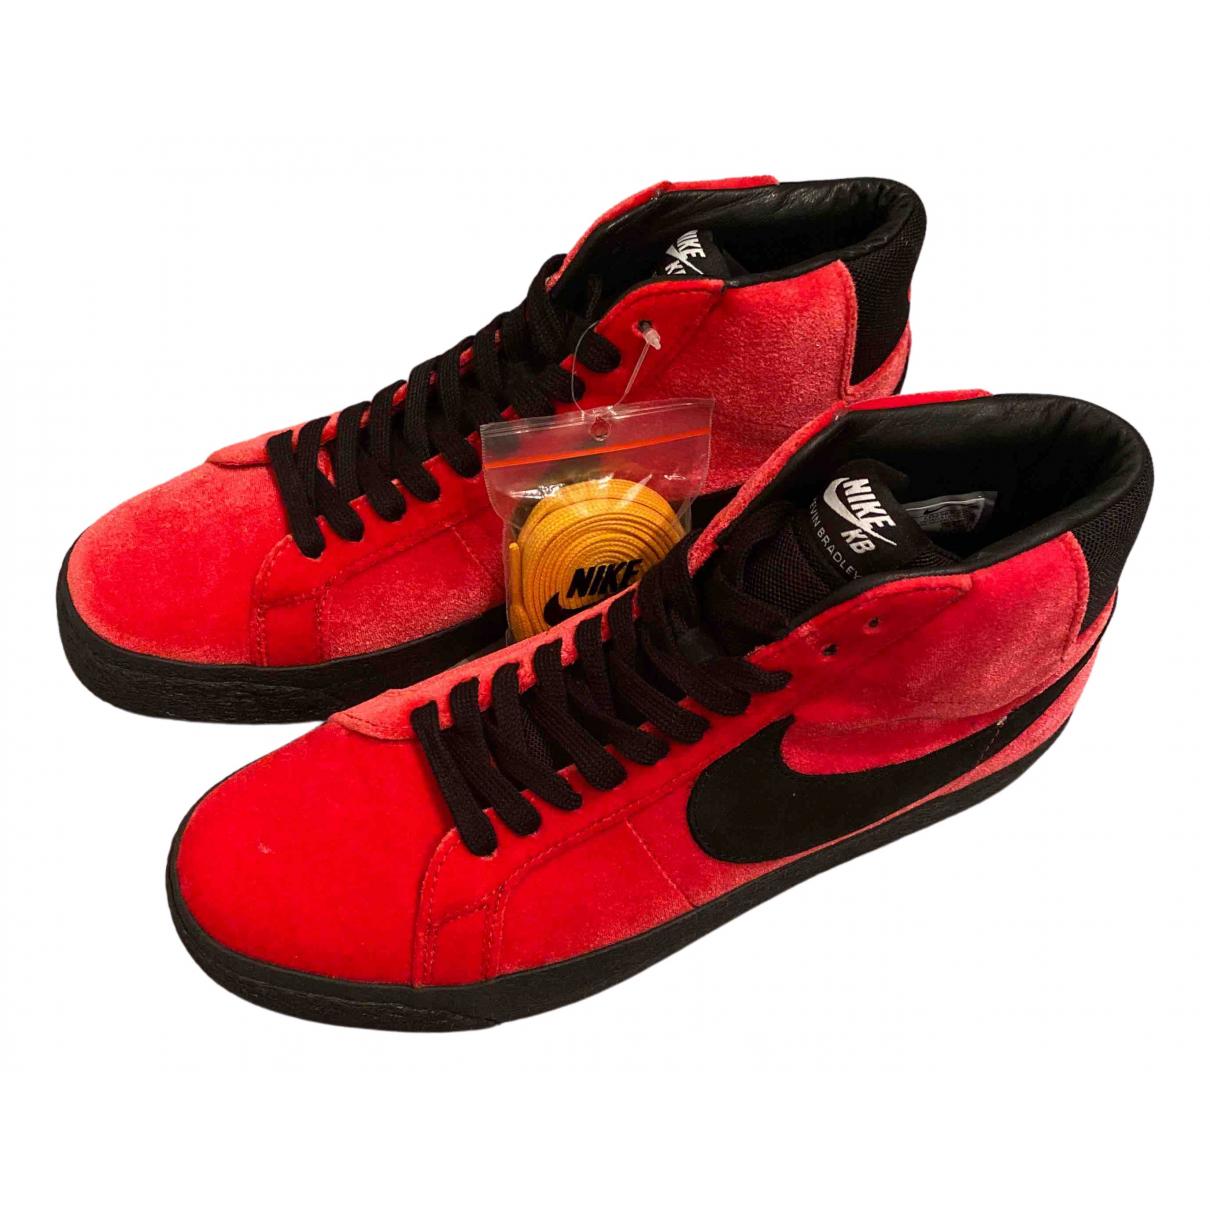 Nike Blazer Red Suede Trainers for Men 42.5 EU